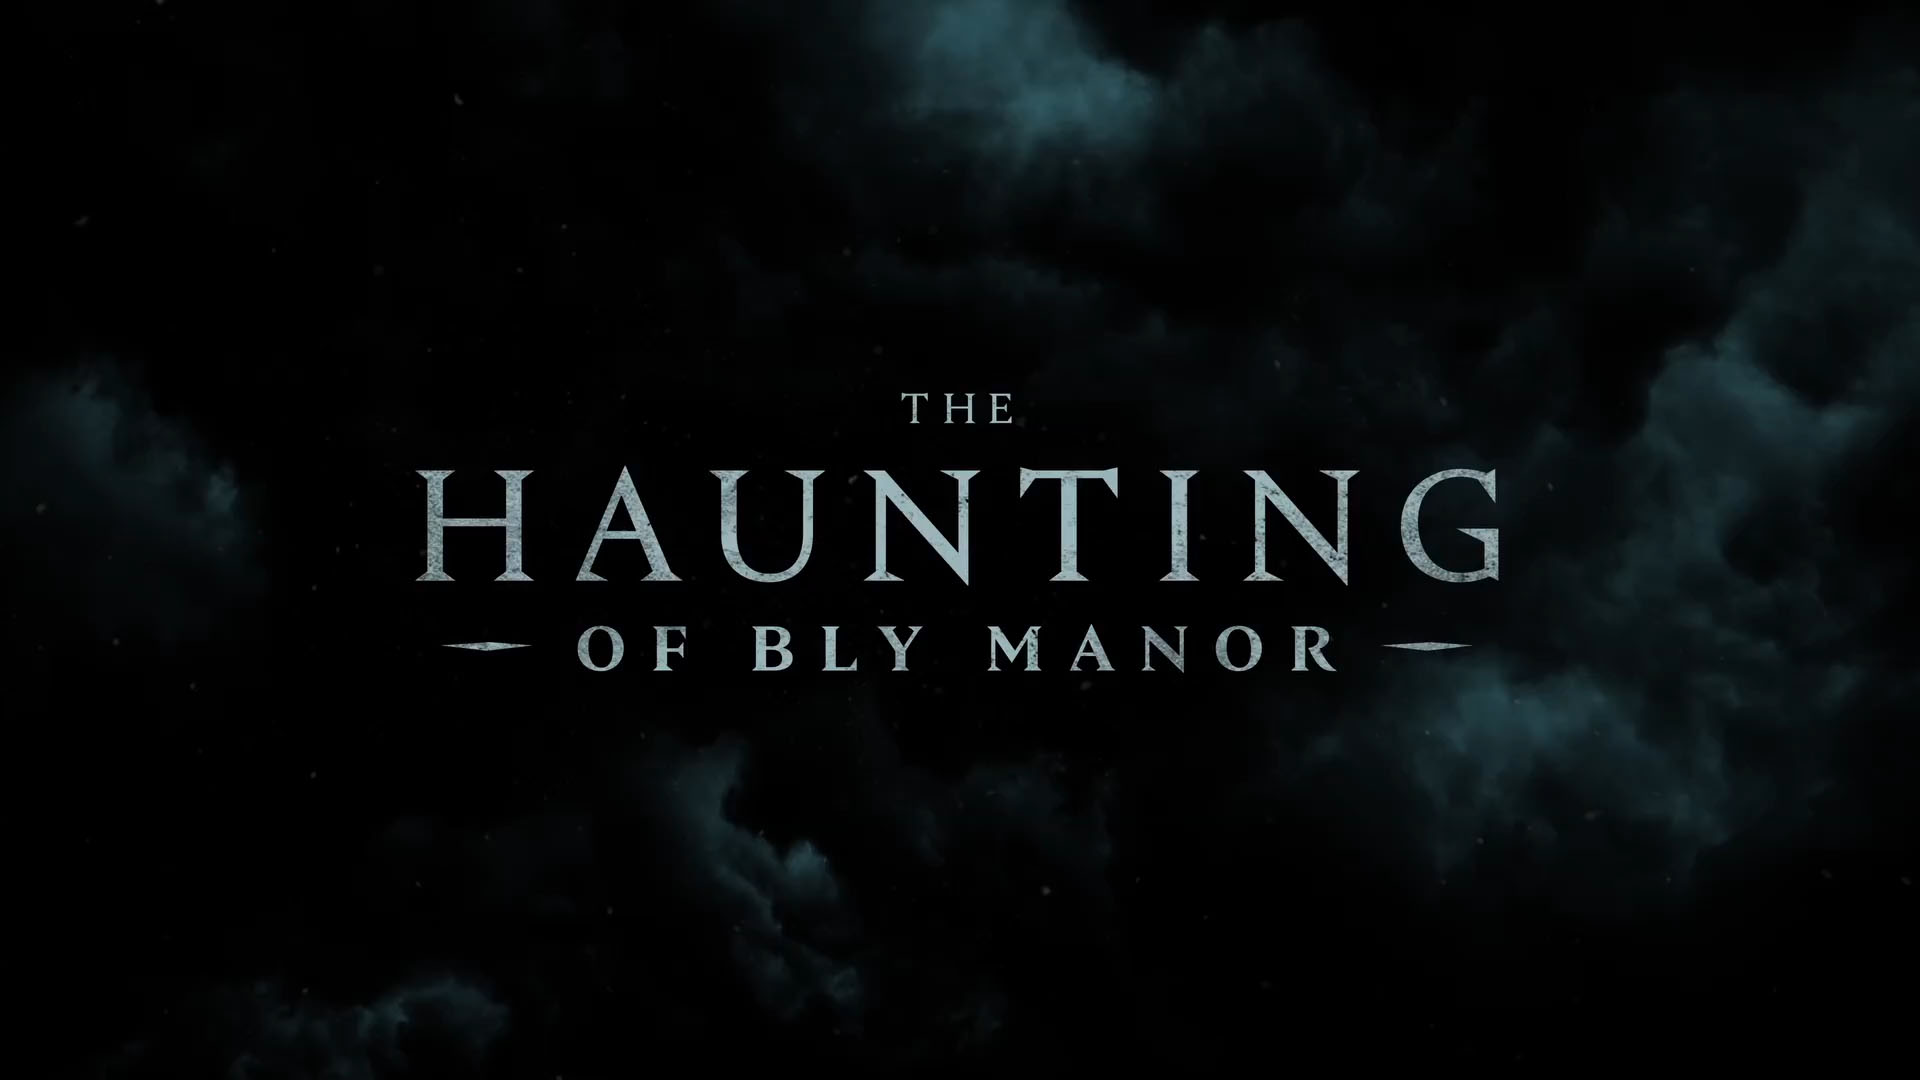 The Haunting of Bly Manor・AppleTV (Netflix)